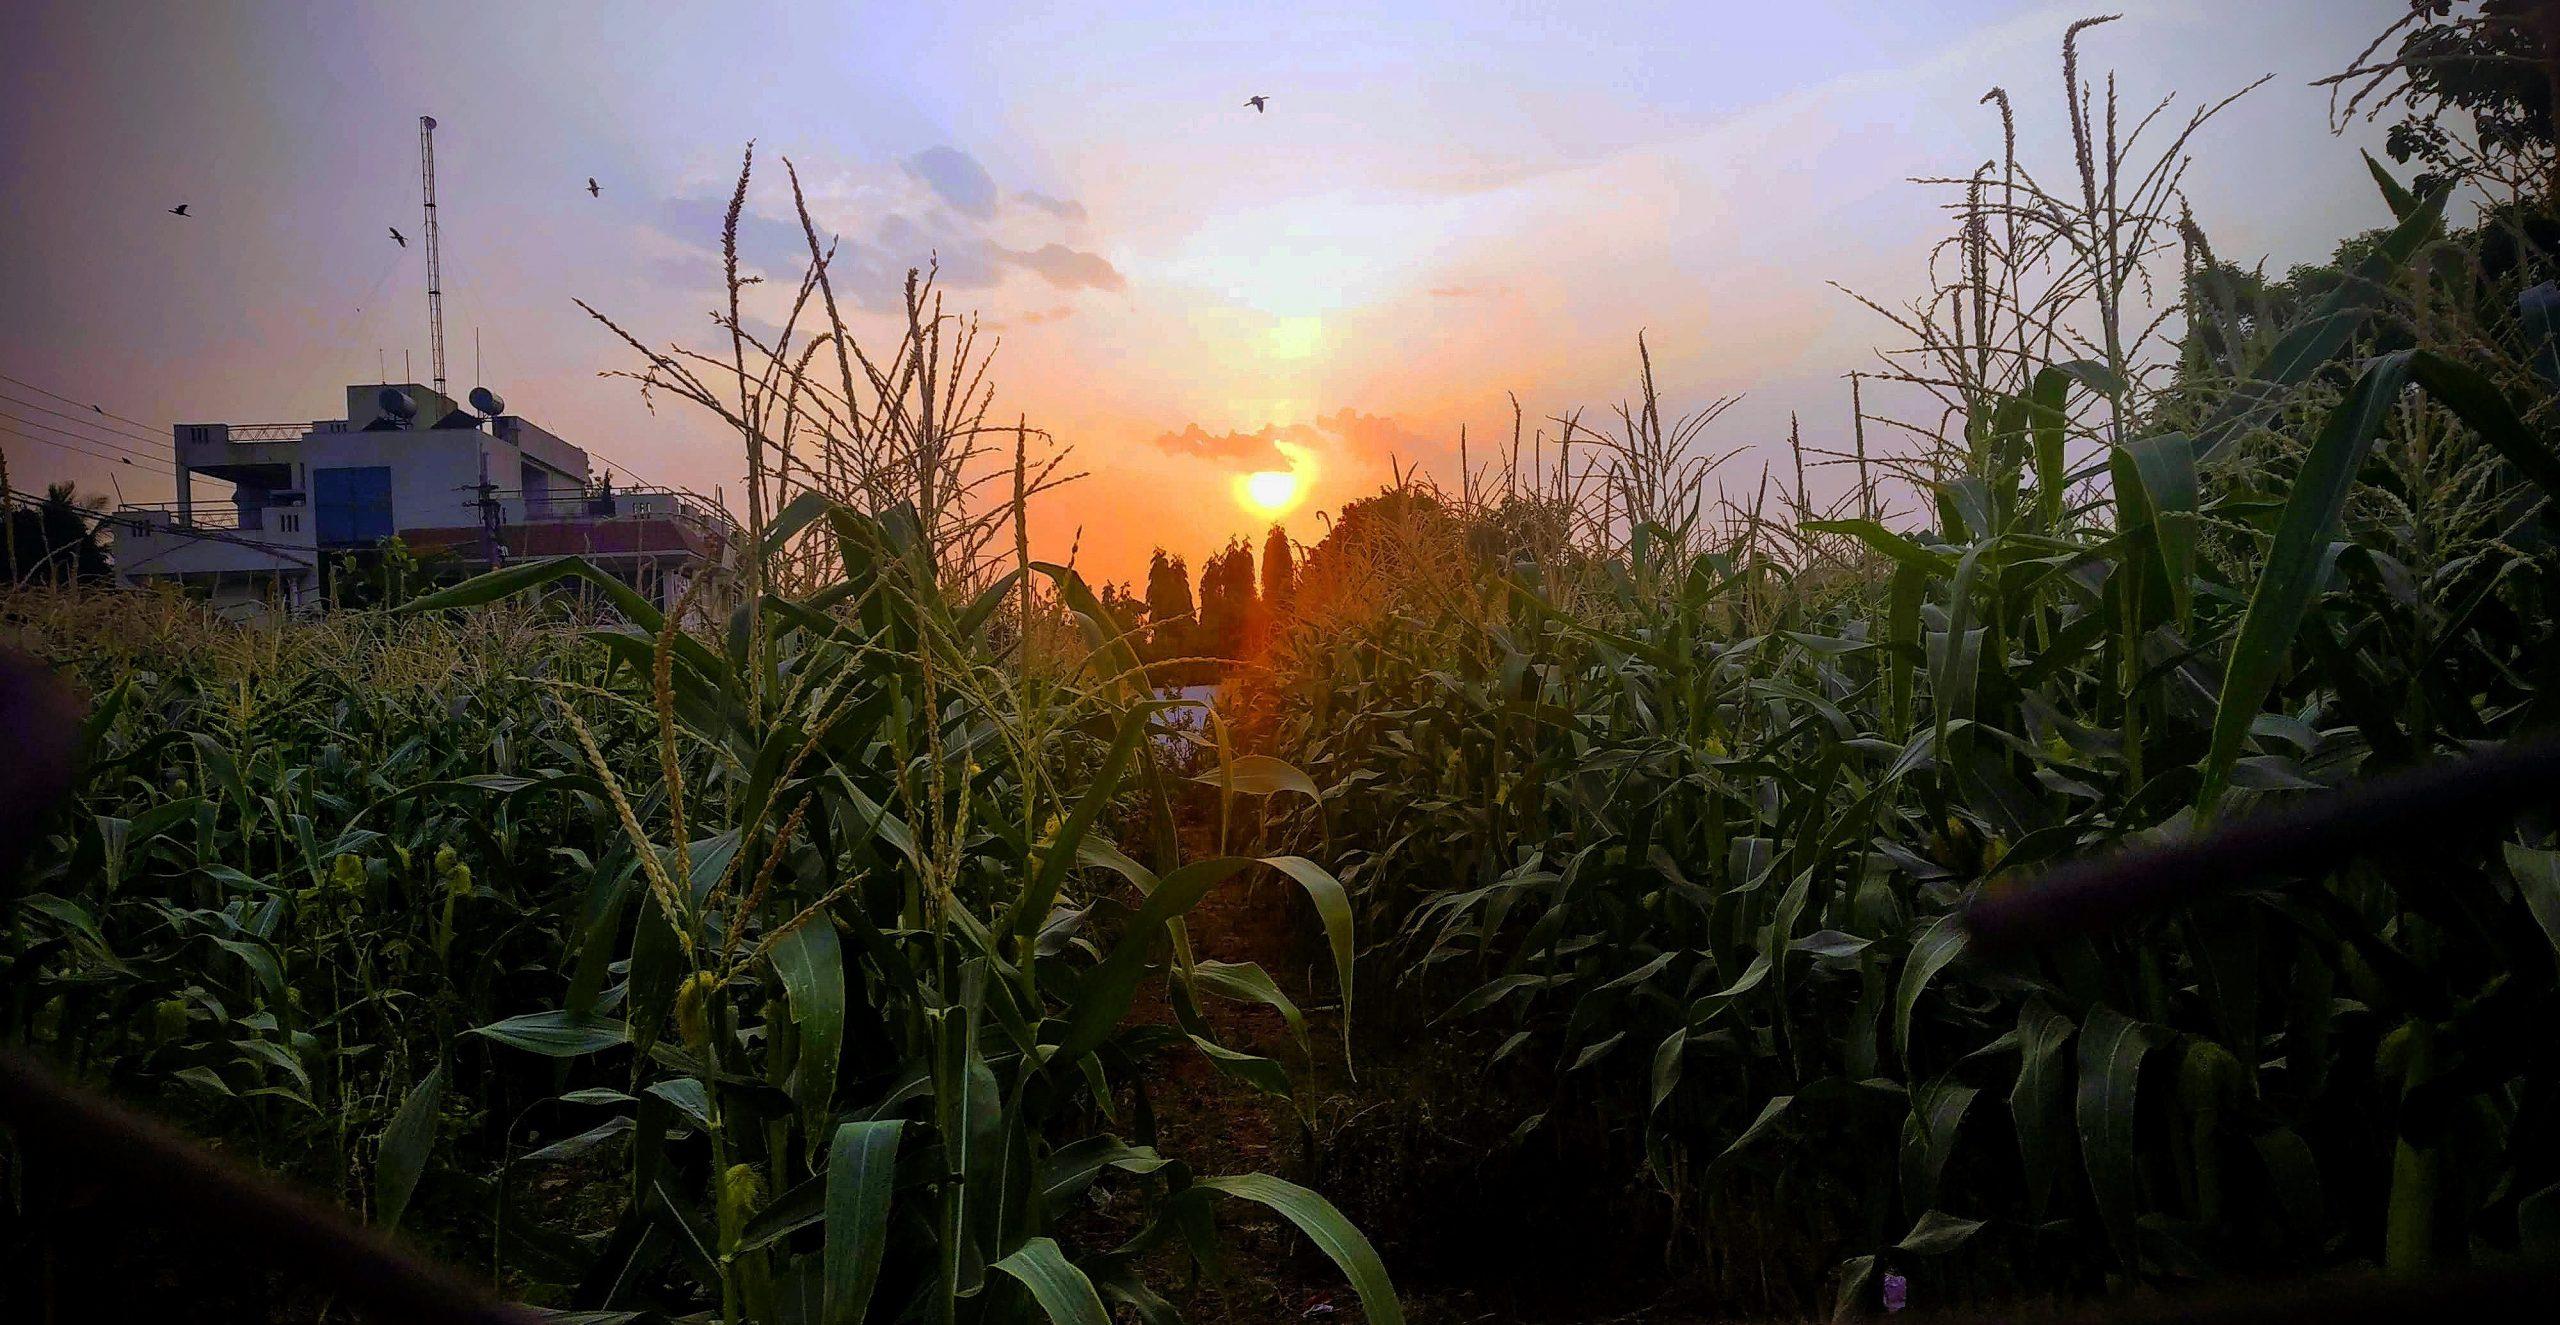 Sunset through corn plants